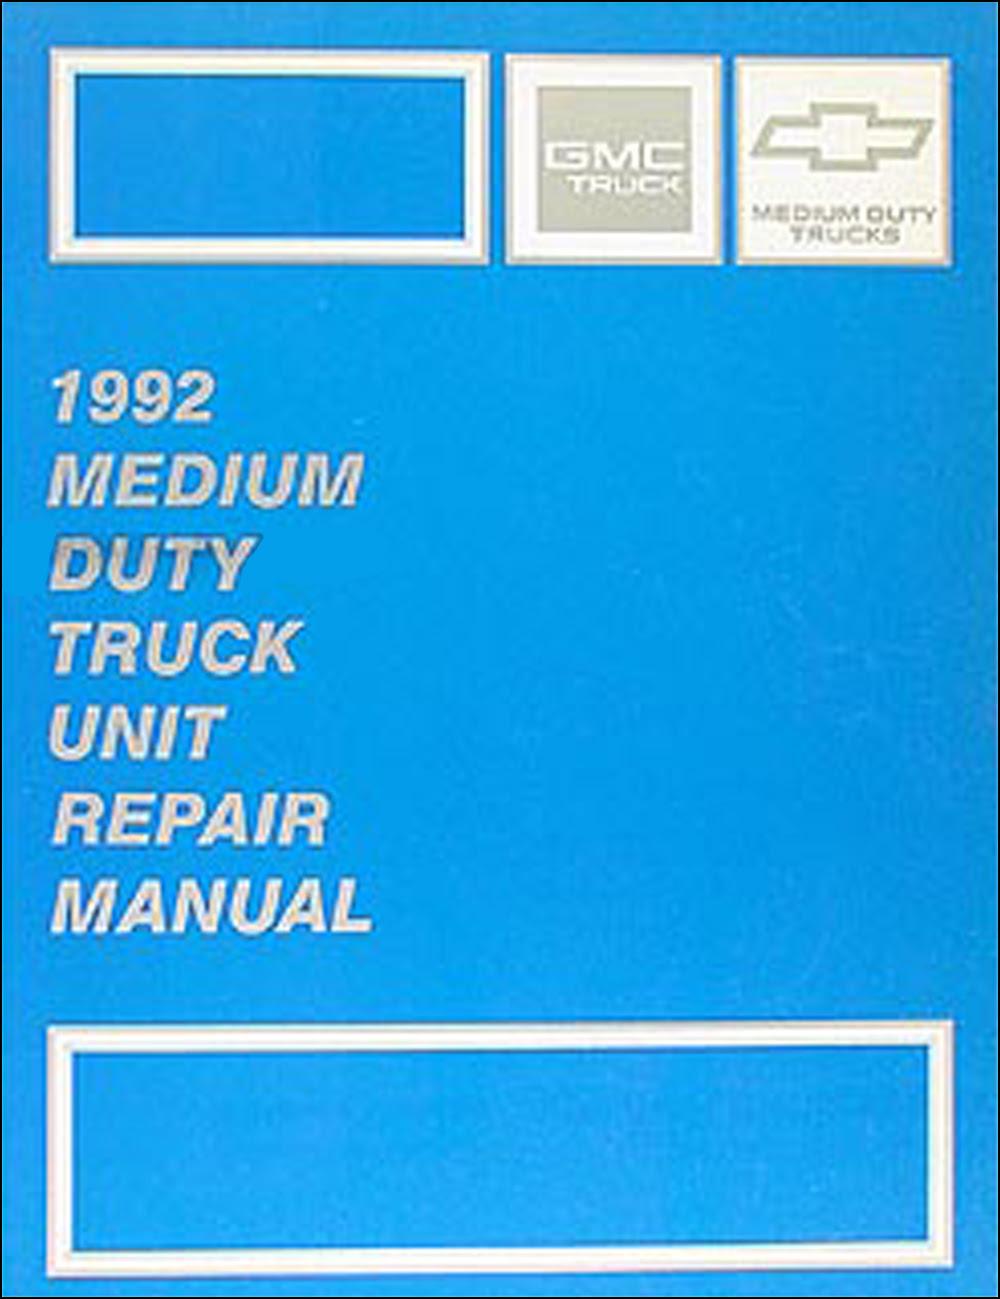 1992 Chevy Kodiak Gmc Topkick And P6 Wiring Diagram Manual Original